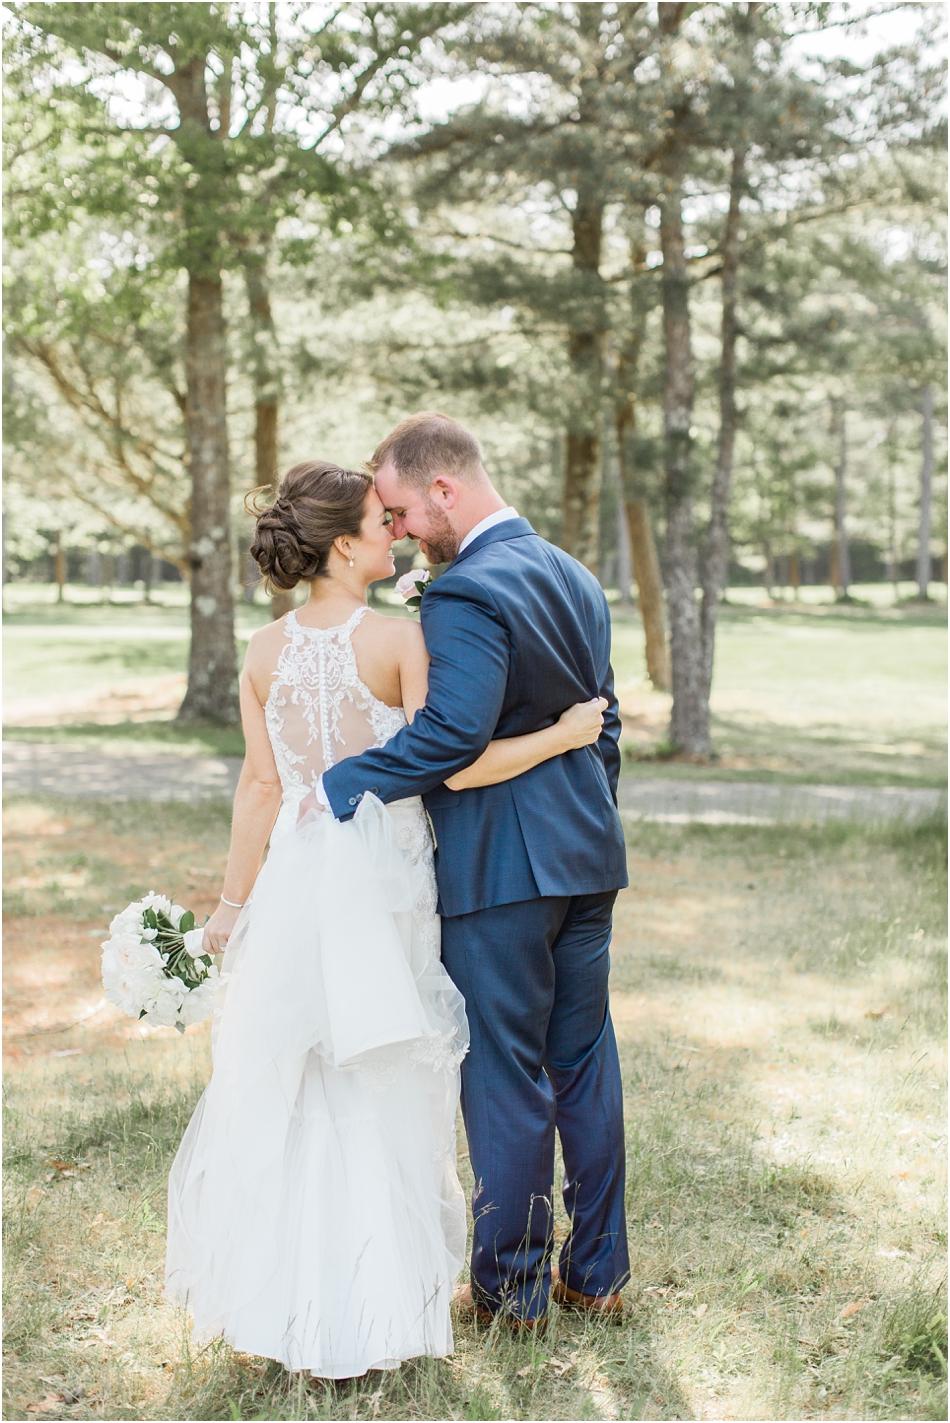 pine_hills_mirbeau_golf_club_boston_massachusetts_cape_cod_new_england_wedding_photographer_Meredith_Jane_Photography_photo_1733.jpg